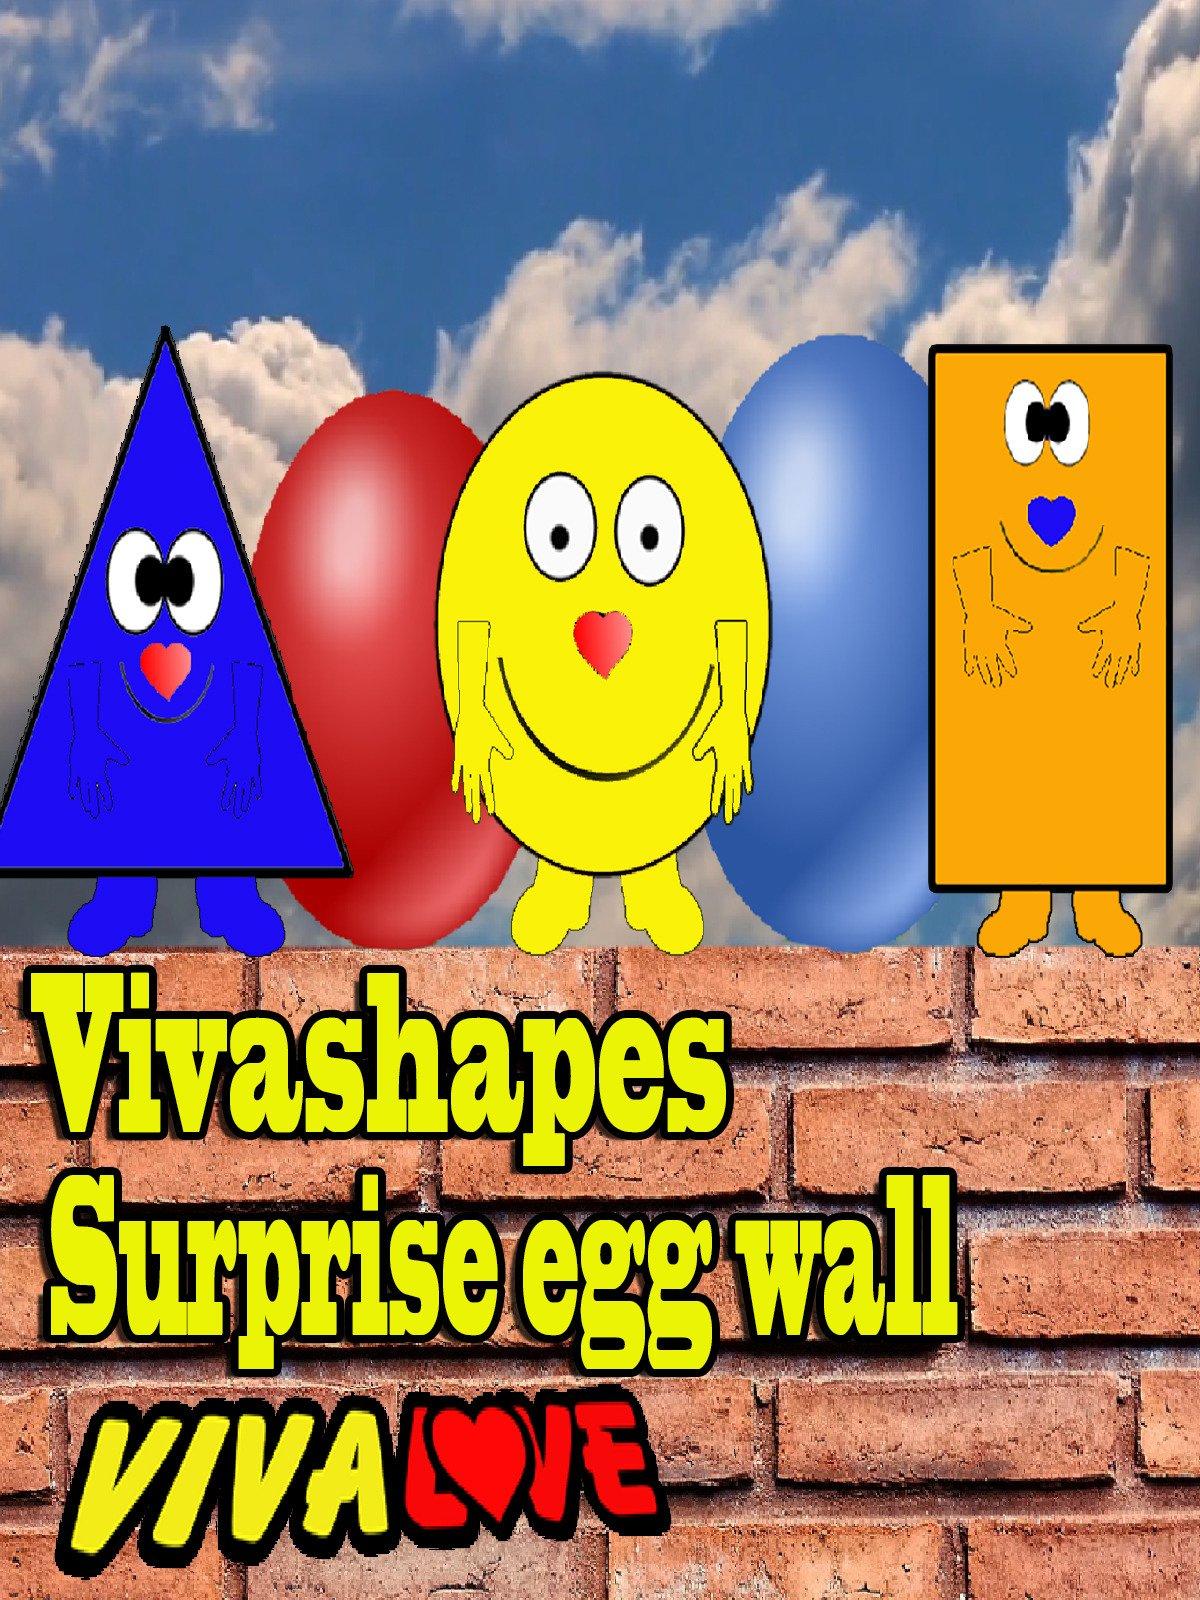 Vivashapes surprise egg wall.